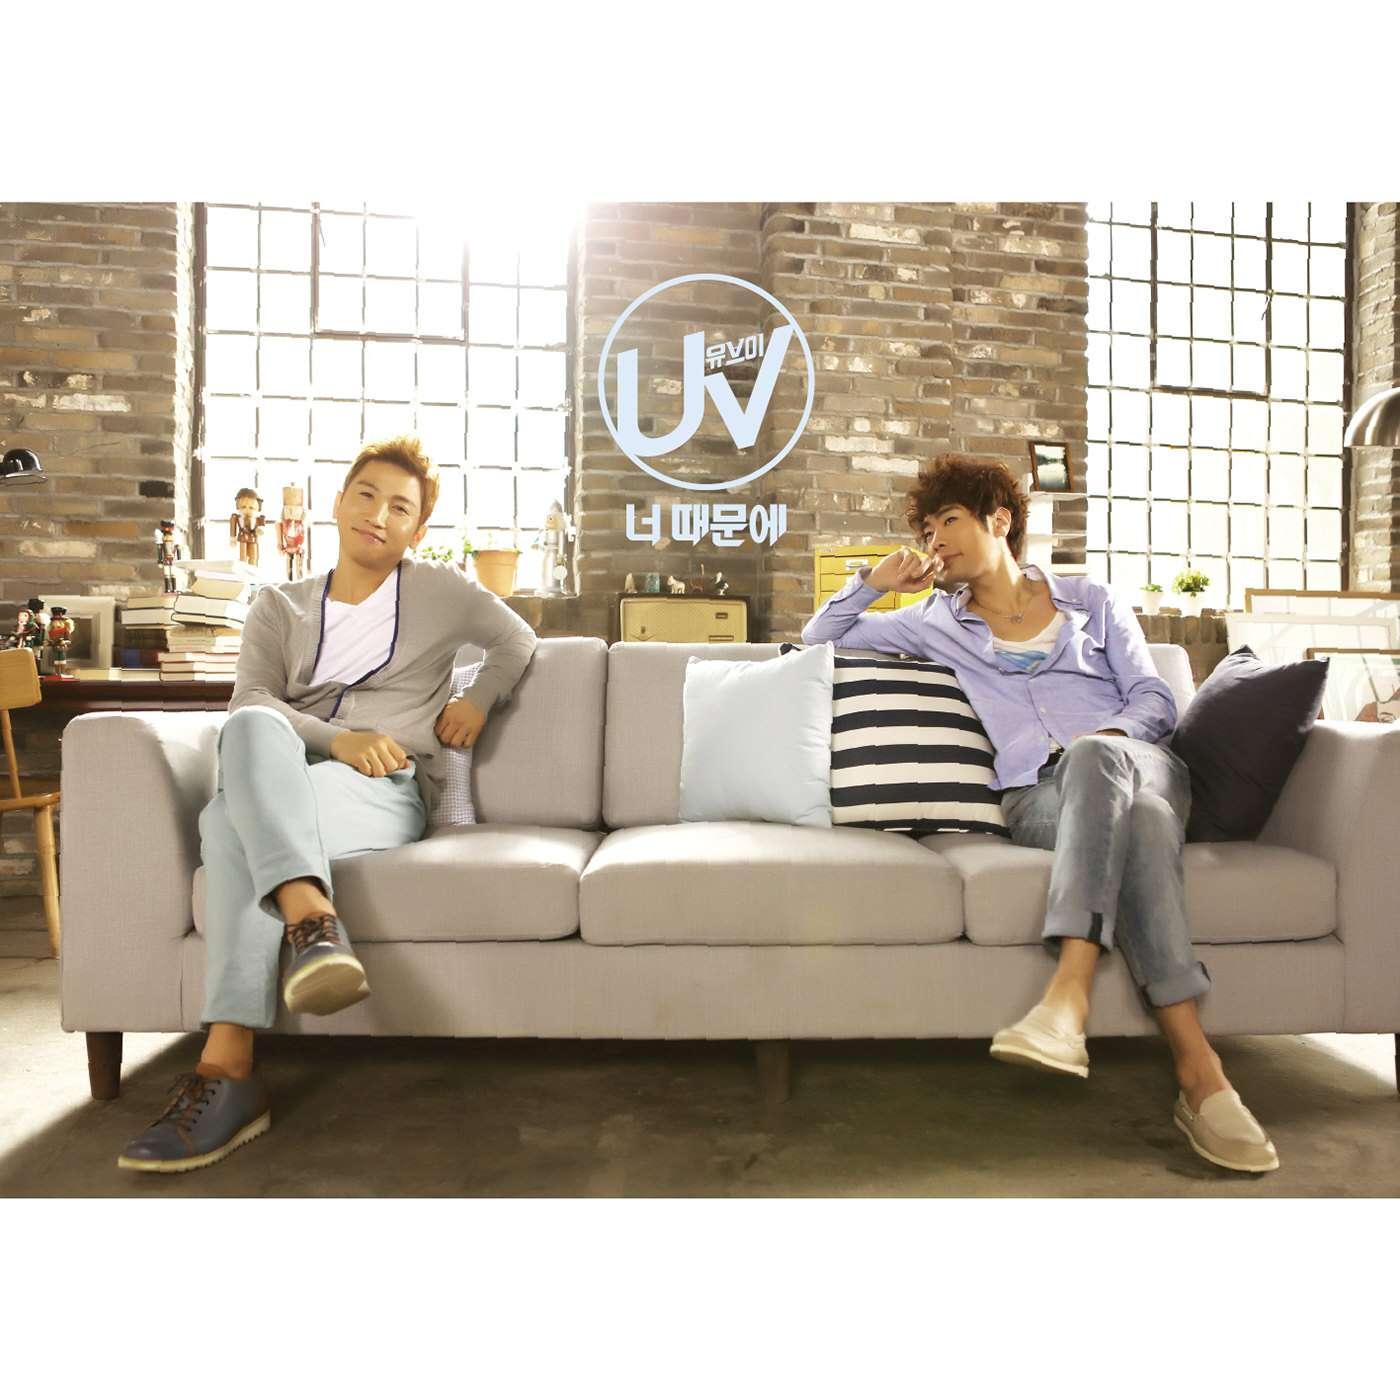 [Single] UV - Because Of You